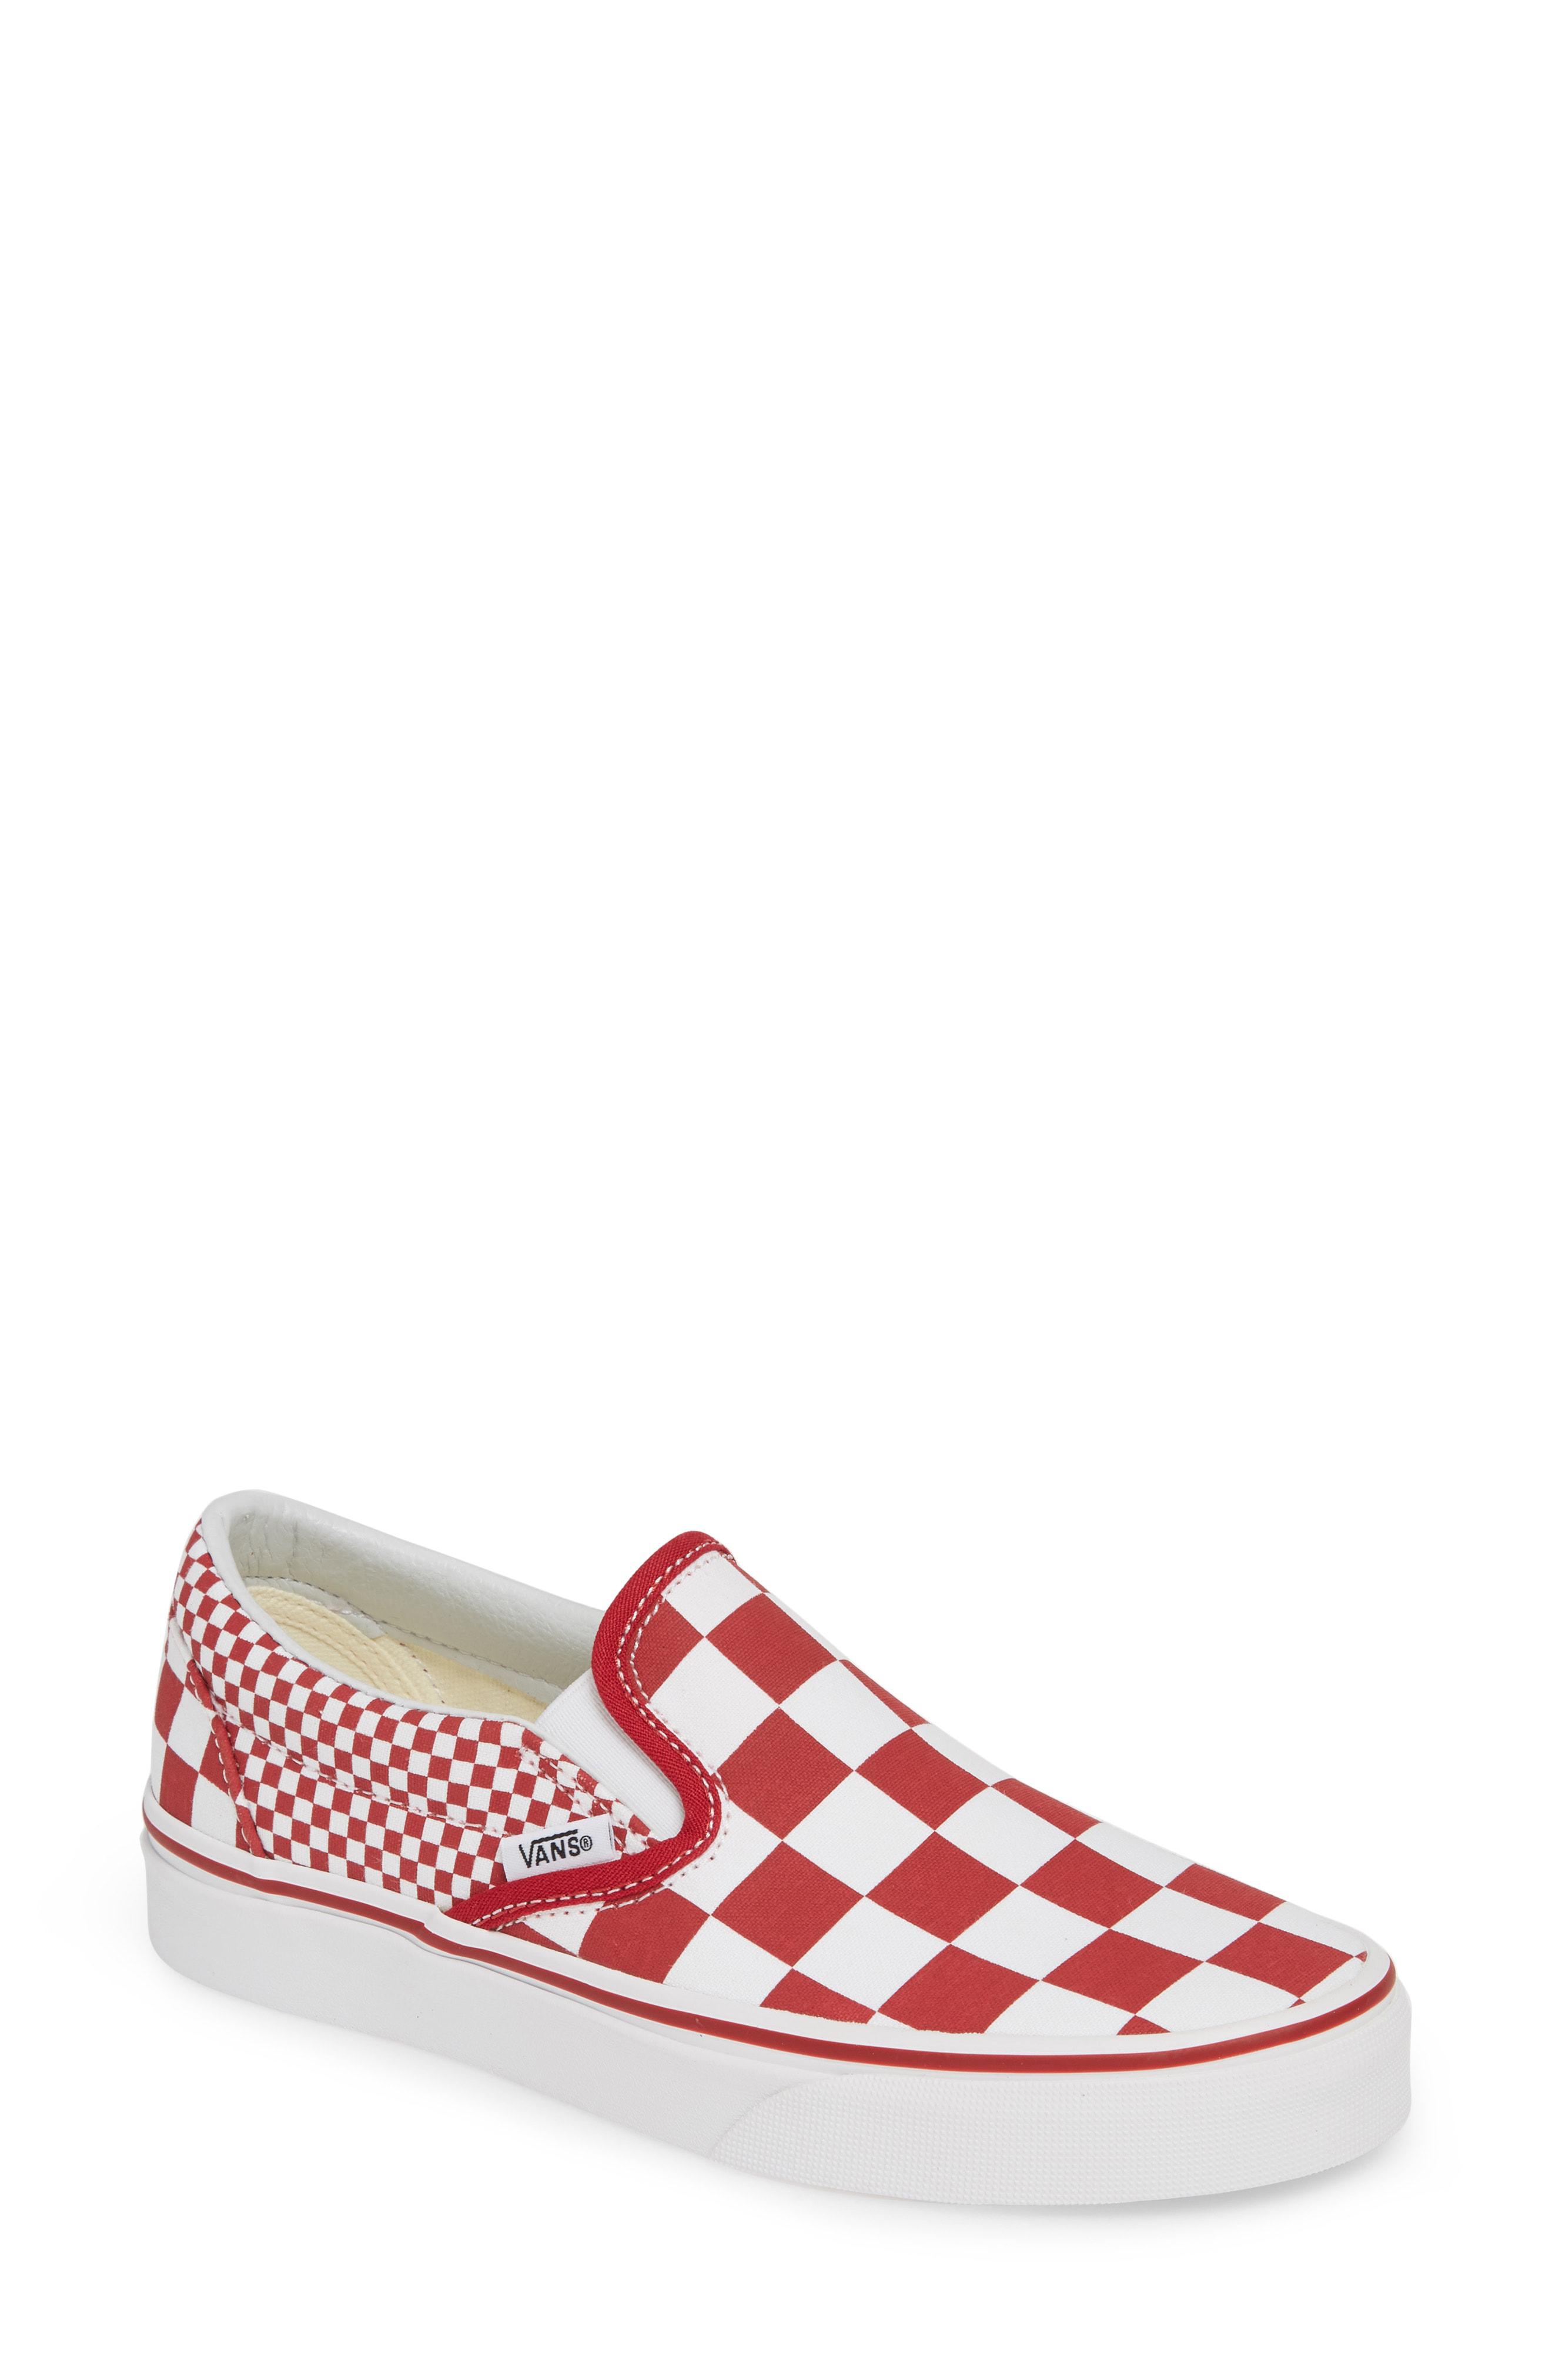 f998e648f355 Vans Classic Slip-On In Rainbow  True White Textile